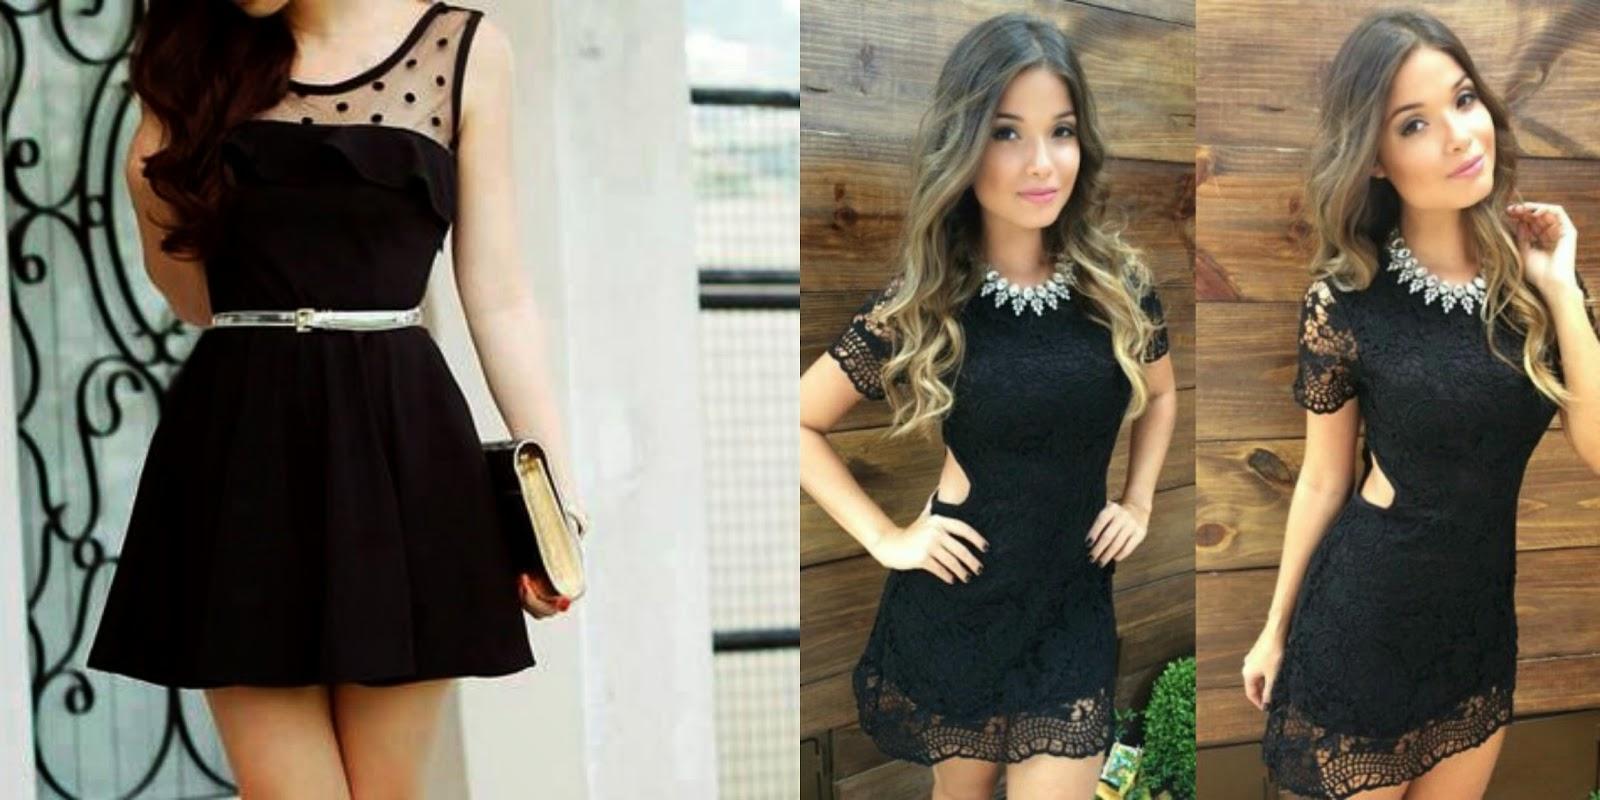 #vestidobasico,#vestidoparabalada,#balada,#looks para balada,#looks para festa a noite,#night